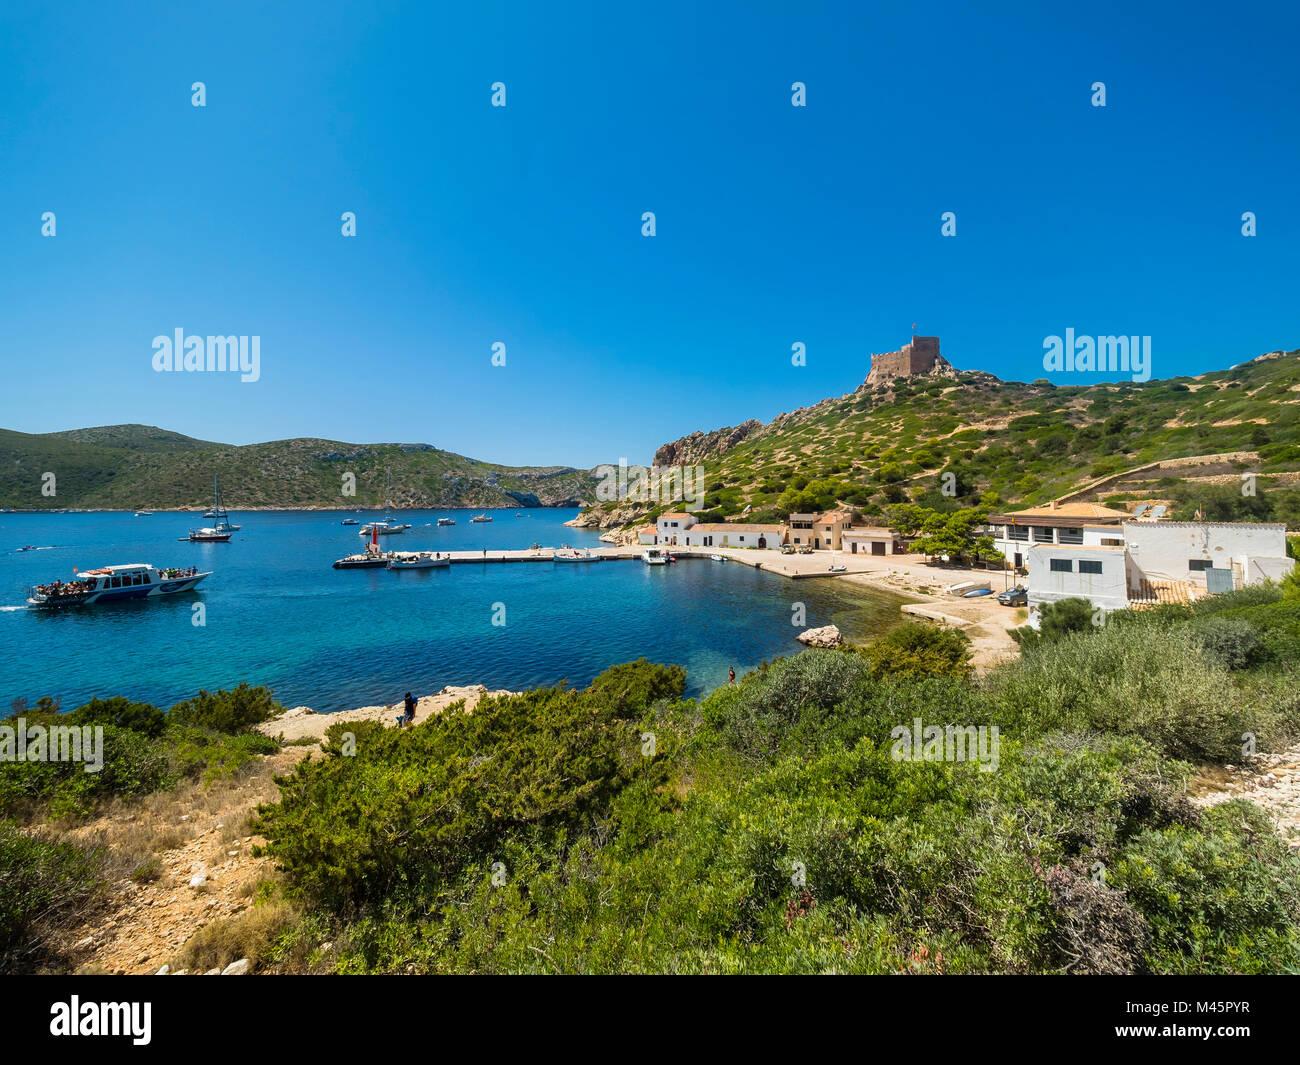 Blick auf den Hafen und die Burg von Cabrera, Colònia de Sant Jordi, Parque Nacional de Cabrera, Cabrera Nationalpark Stockbild